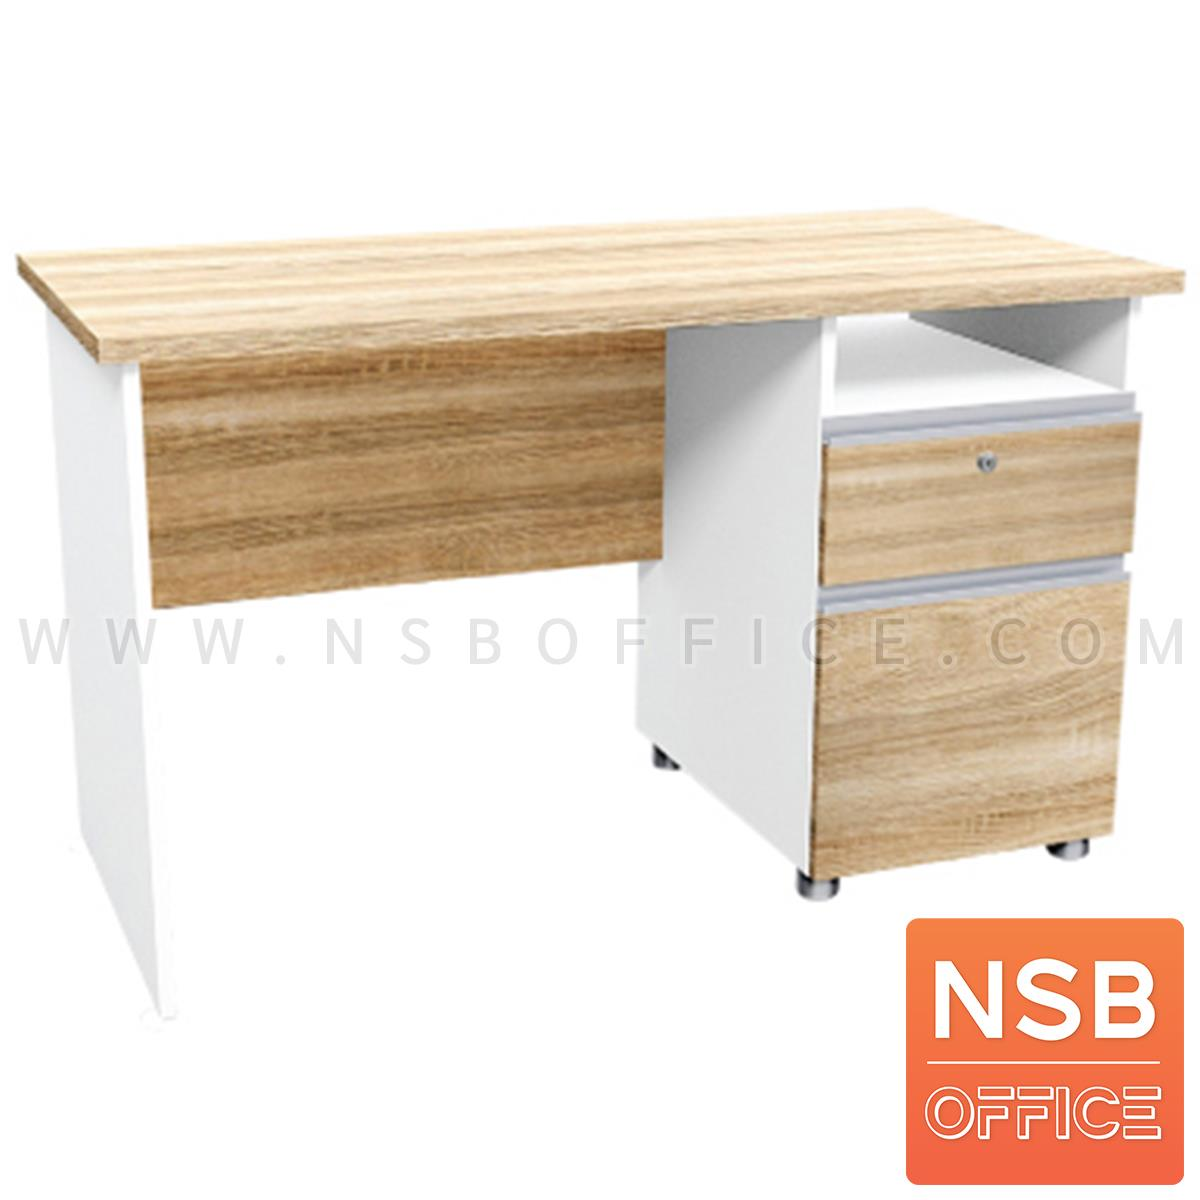 A21A002:โต๊ะทำงาน 2 ลิ้นชัก รุ่น Banderas (แบนเดอราส) ขนาด 120W ,150W ,160W cm.  เมลามีน สีเนเจอร์ทีค-ขาว